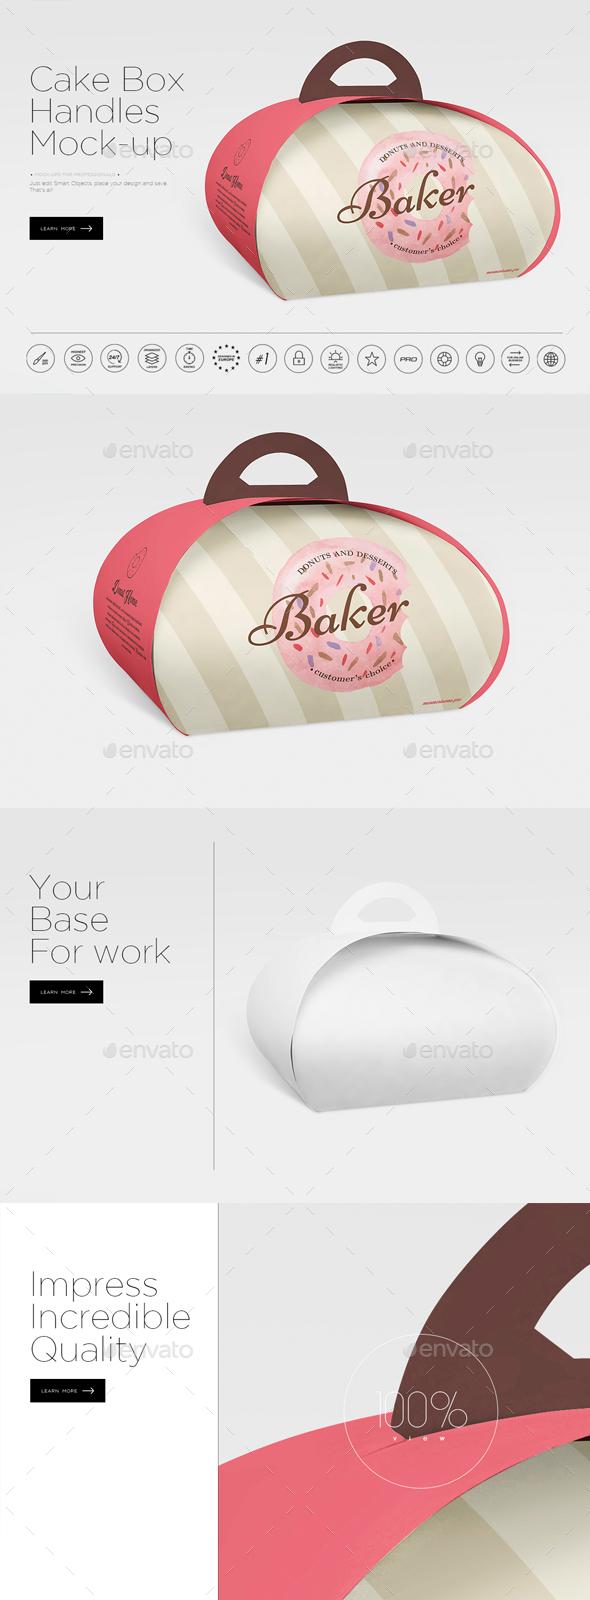 Graphicriver Handbag Cake Box Mock-up 19287420